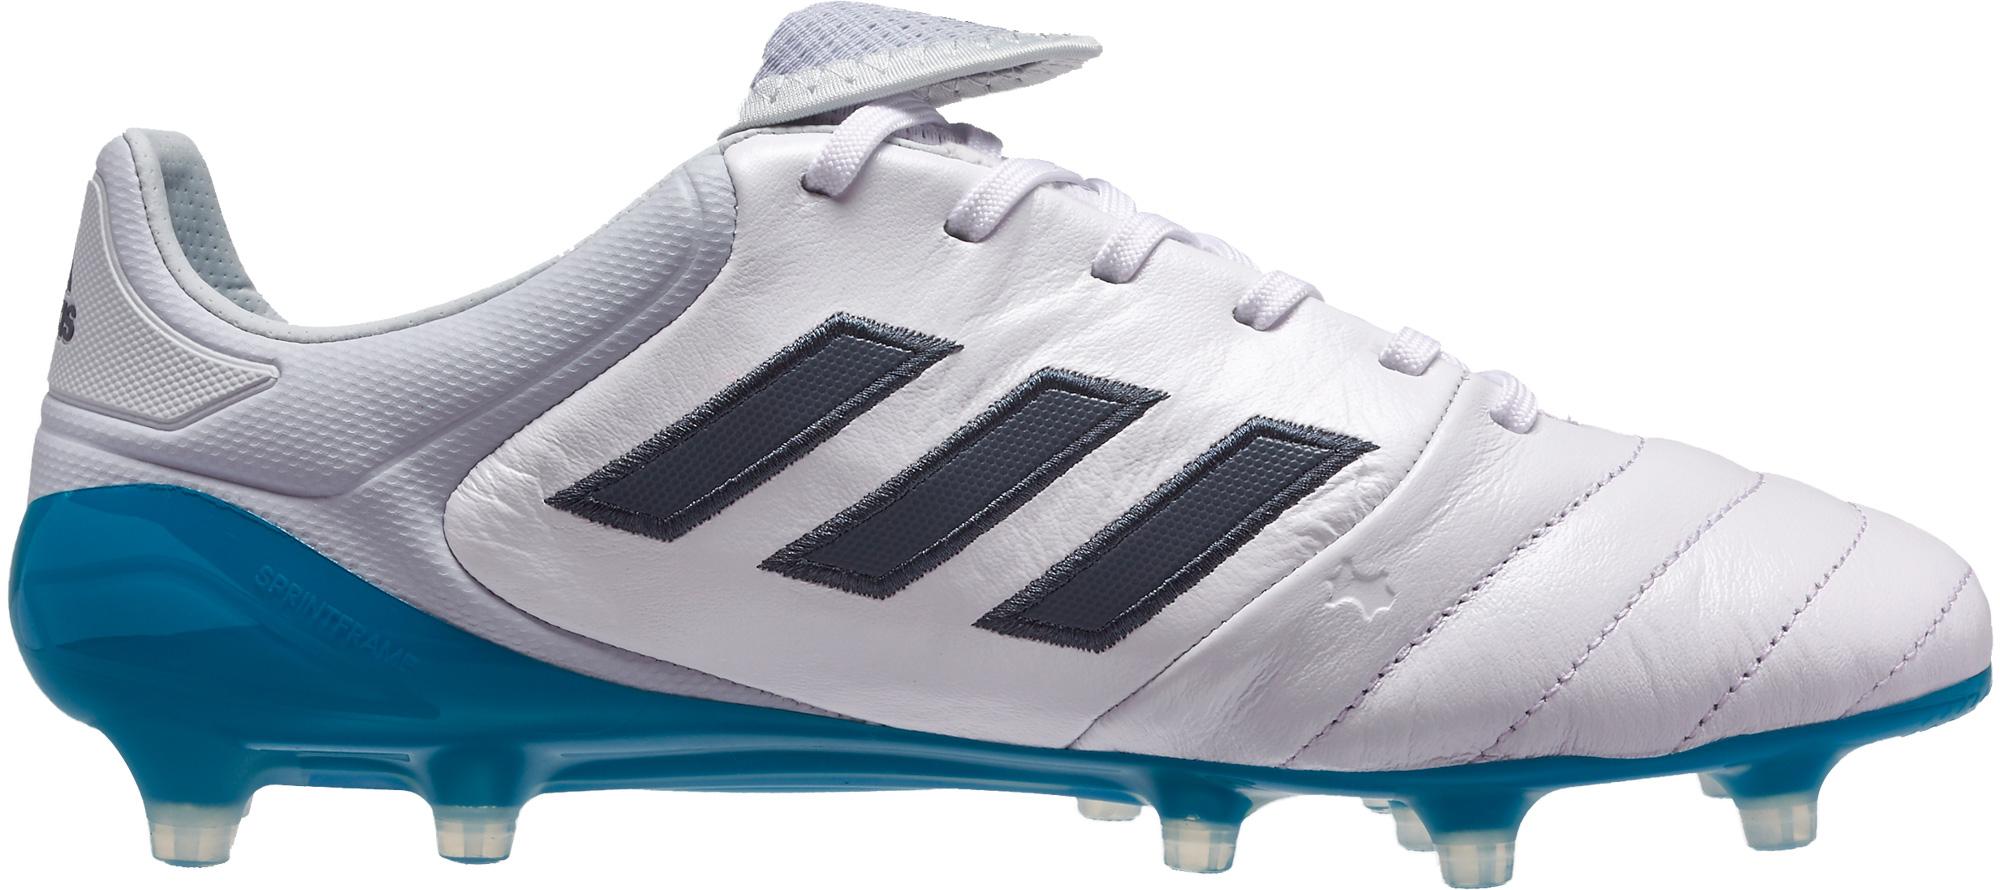 Adidas Copa 17 1 Fg Adidas Copa Soccer Cleats